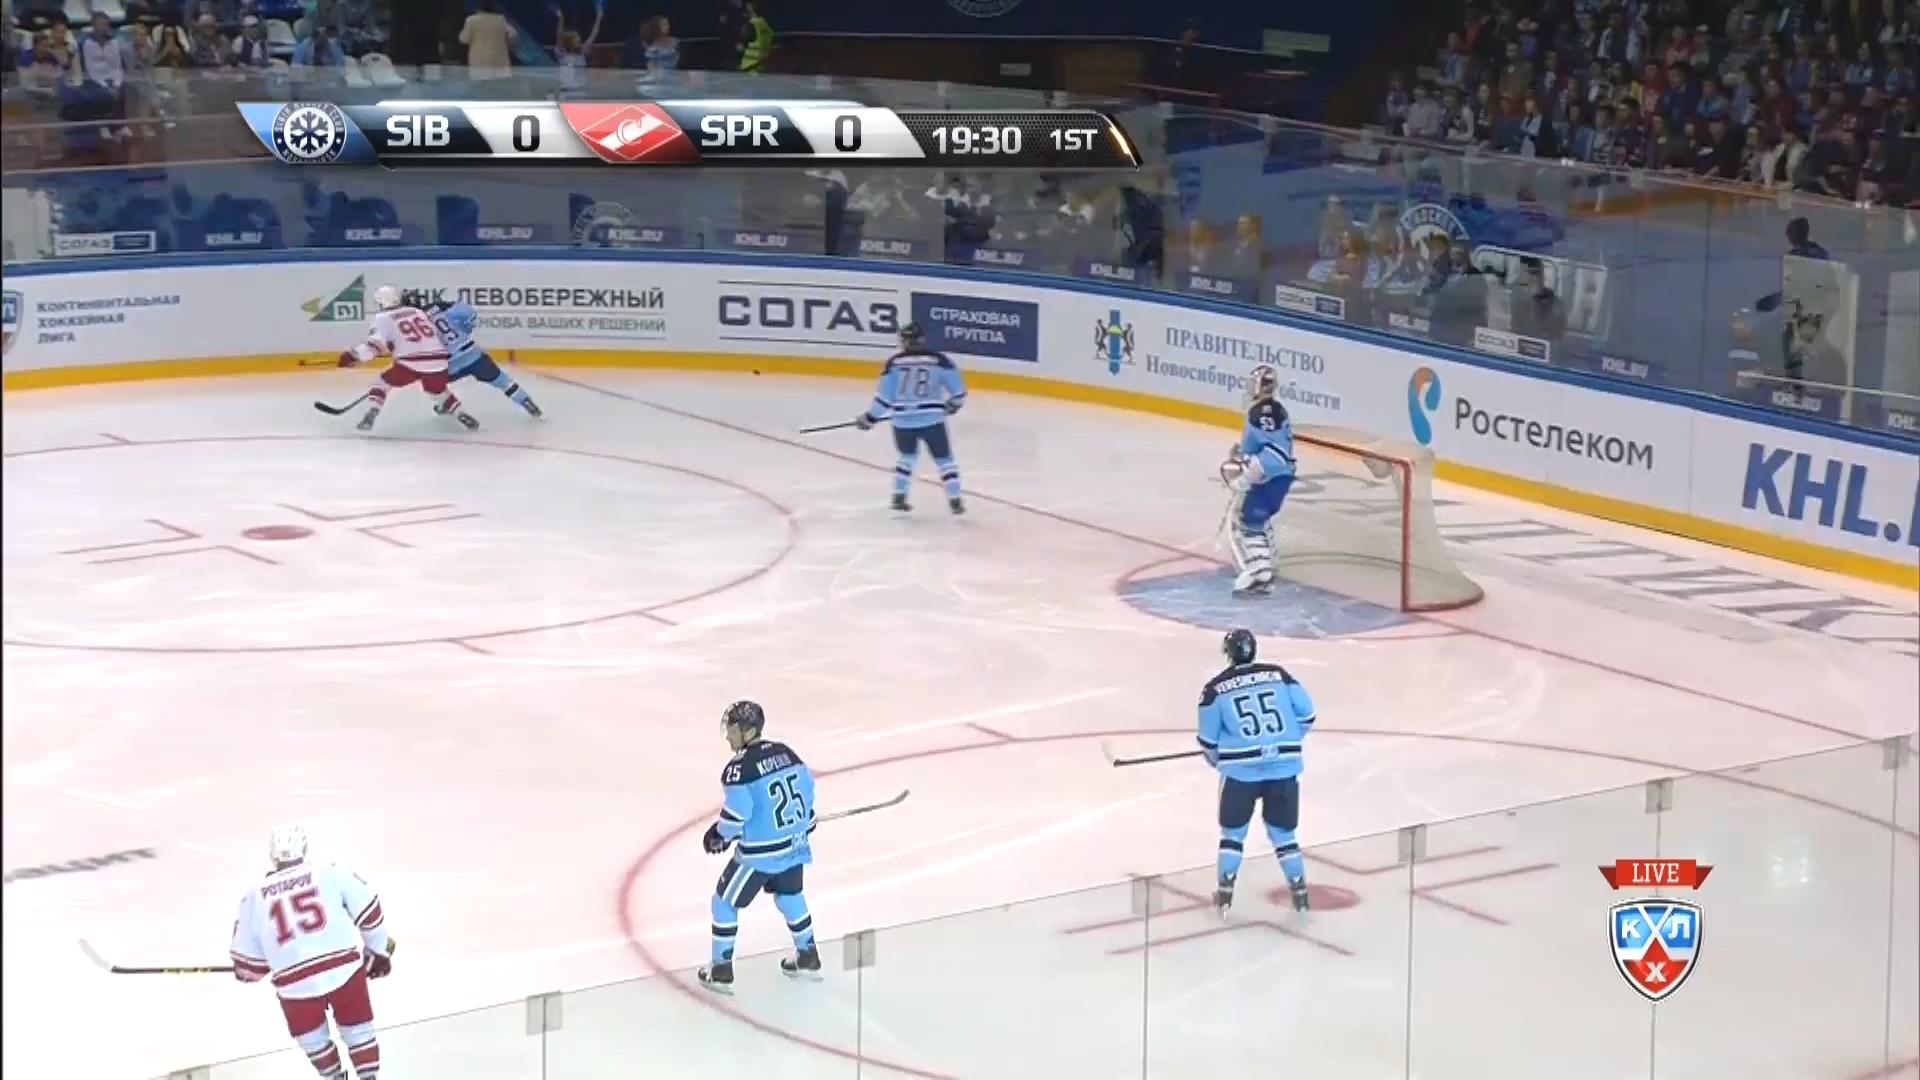 KHL.2015.09.06.Sibir@Spartak.1080p25.mkv_20150906_224414.921.jpg